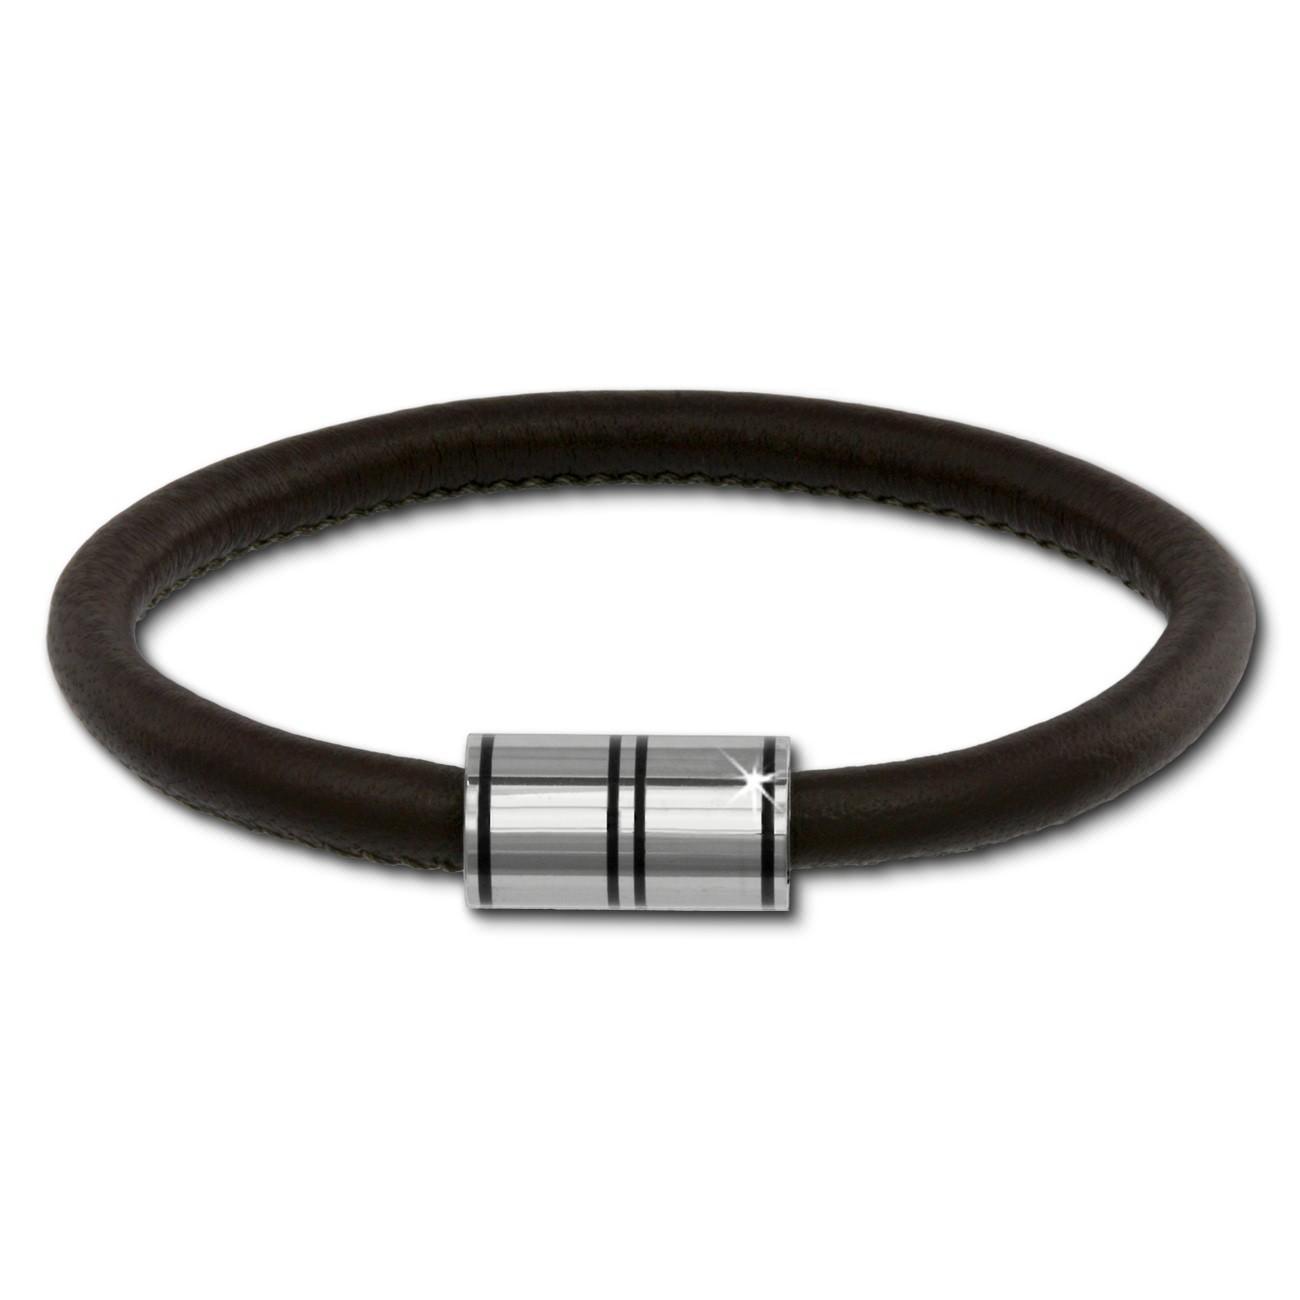 SilberDream Nappa Leder Armband braun 20cm Edelstahlverschluss LAB1120